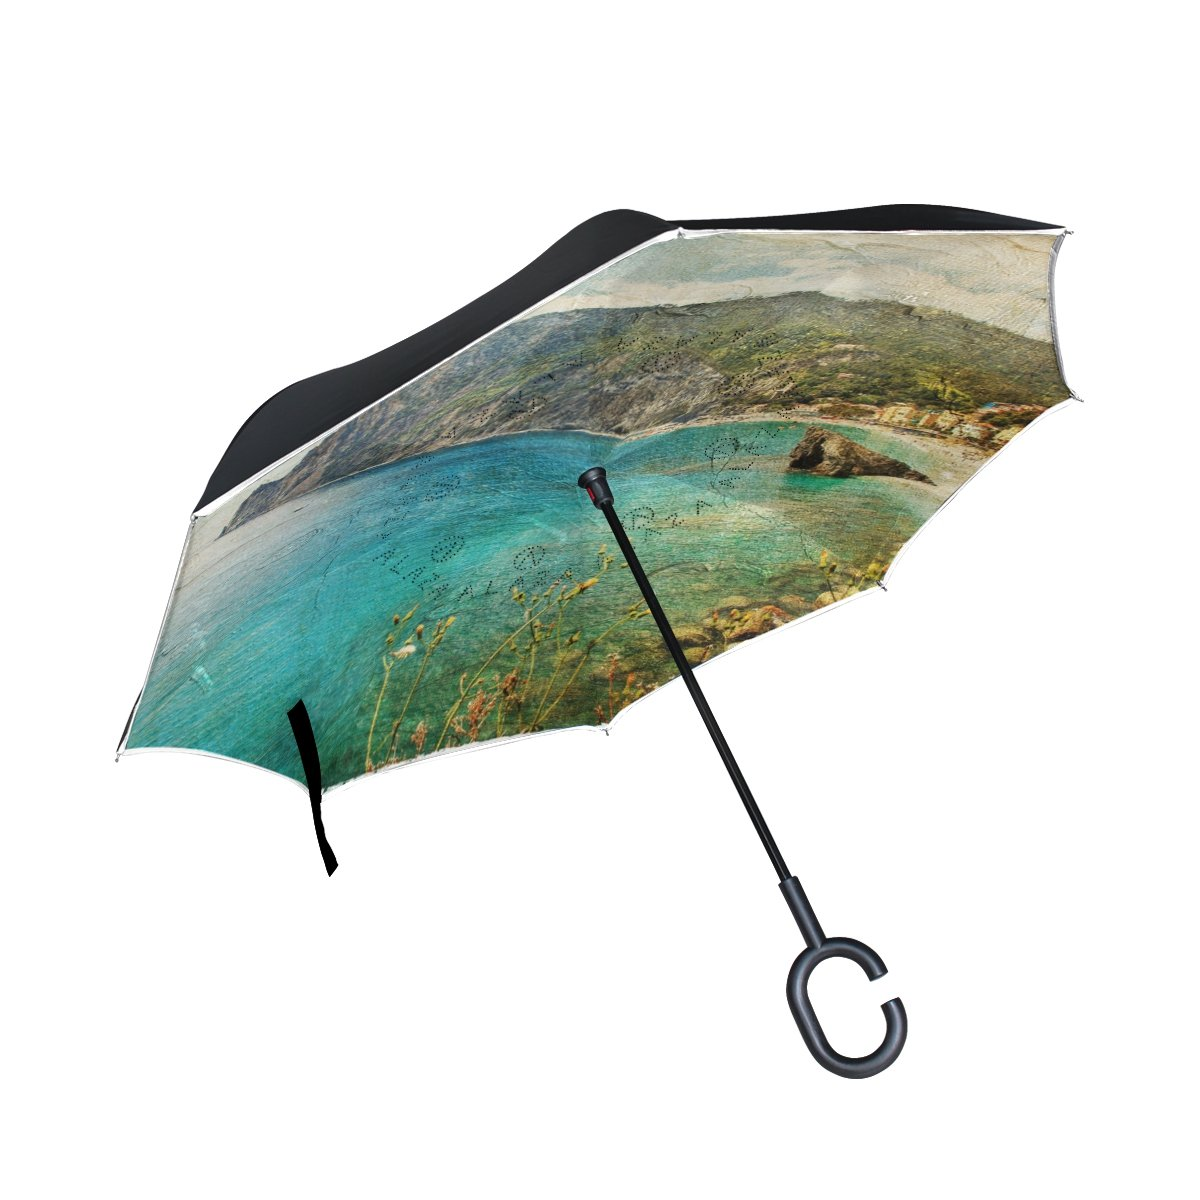 My Daily Double Layer Inverted Umbrella Cars Reverse Umbrella Italian Coast Retro Artwork Vintage Painting Windproof UV Proof Travel Outdoor Umbrella   B0762HG1H1